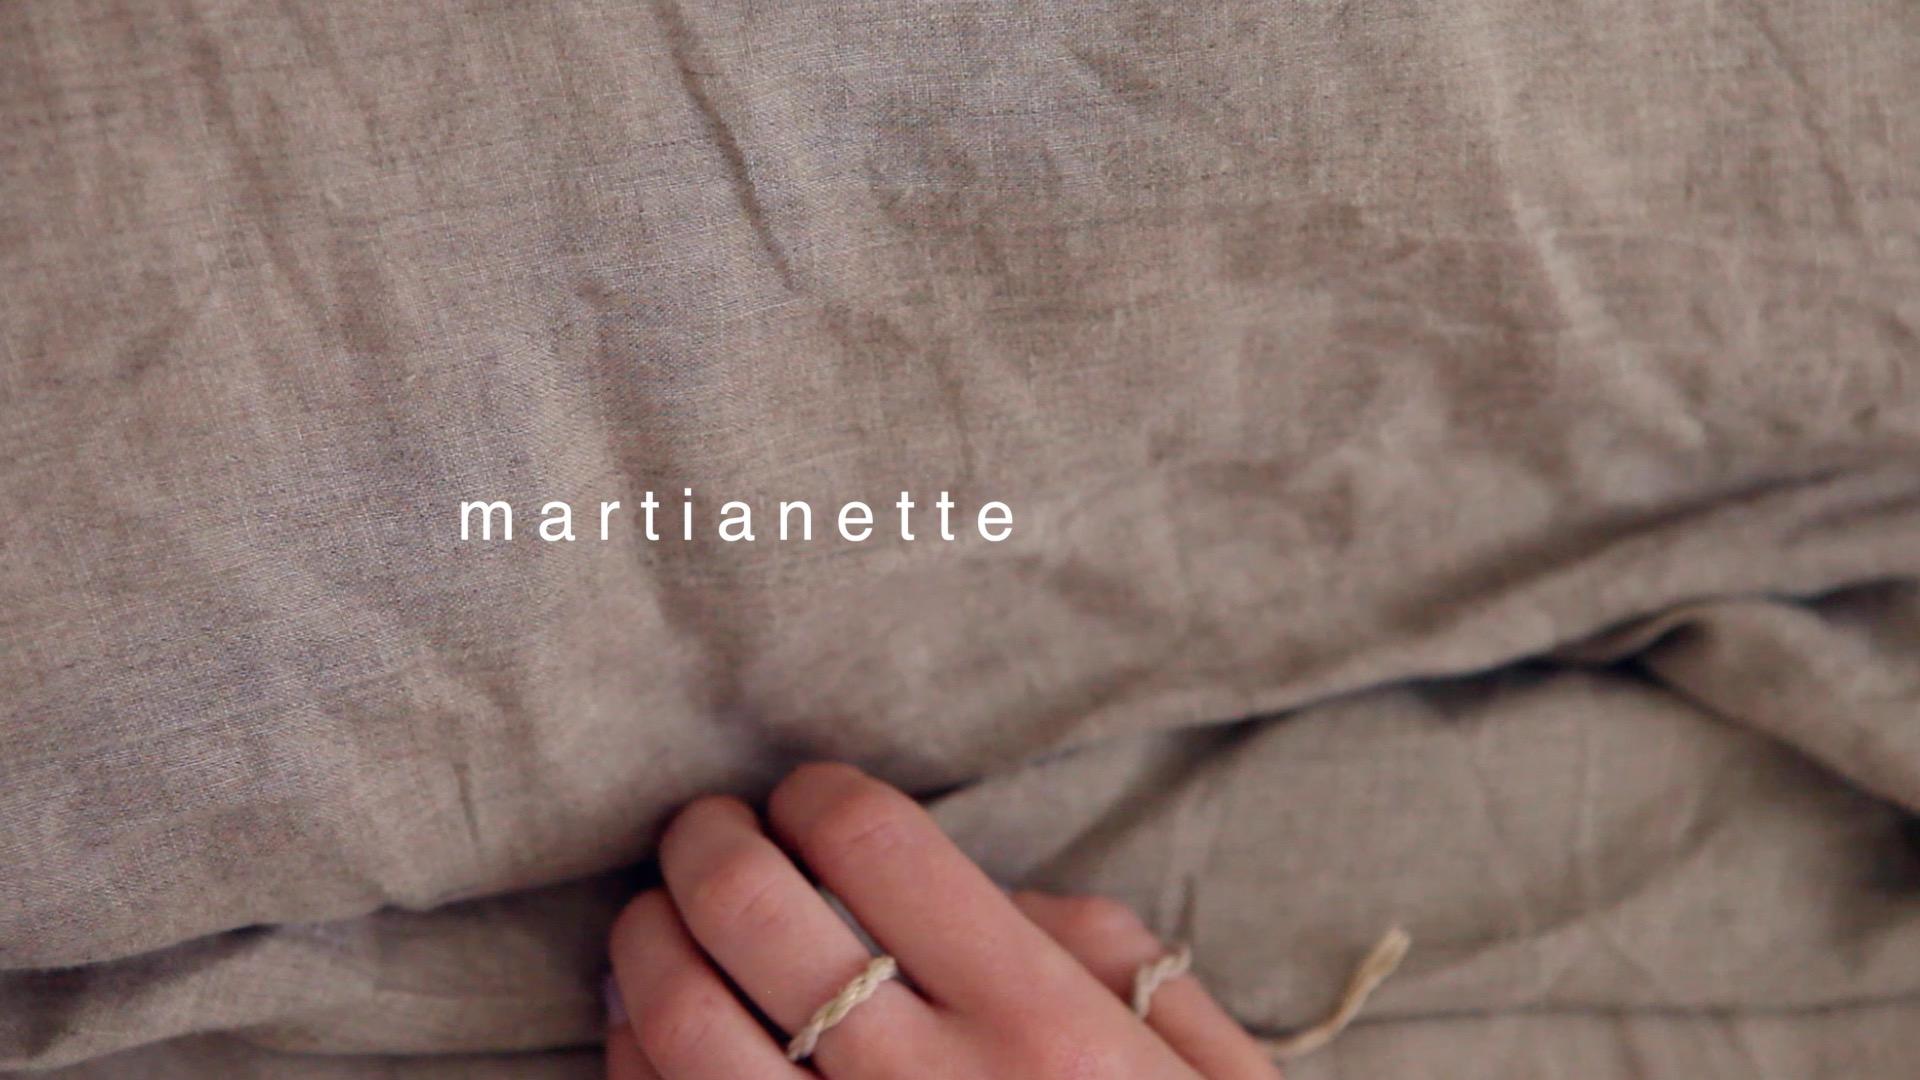 Martianette Promo Still 1.jpg